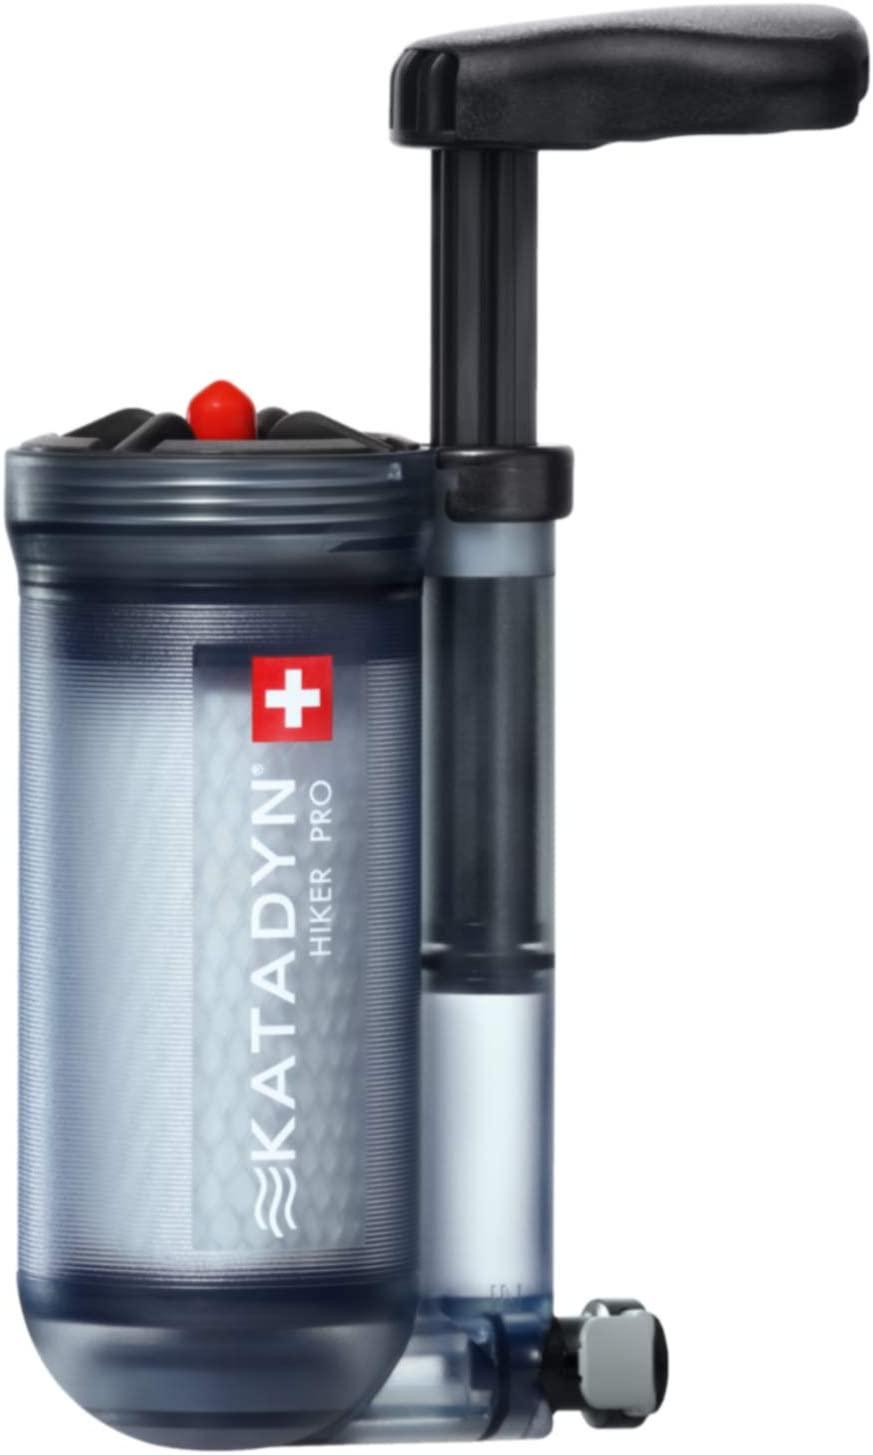 Katadyn Hiker Pro travel filter